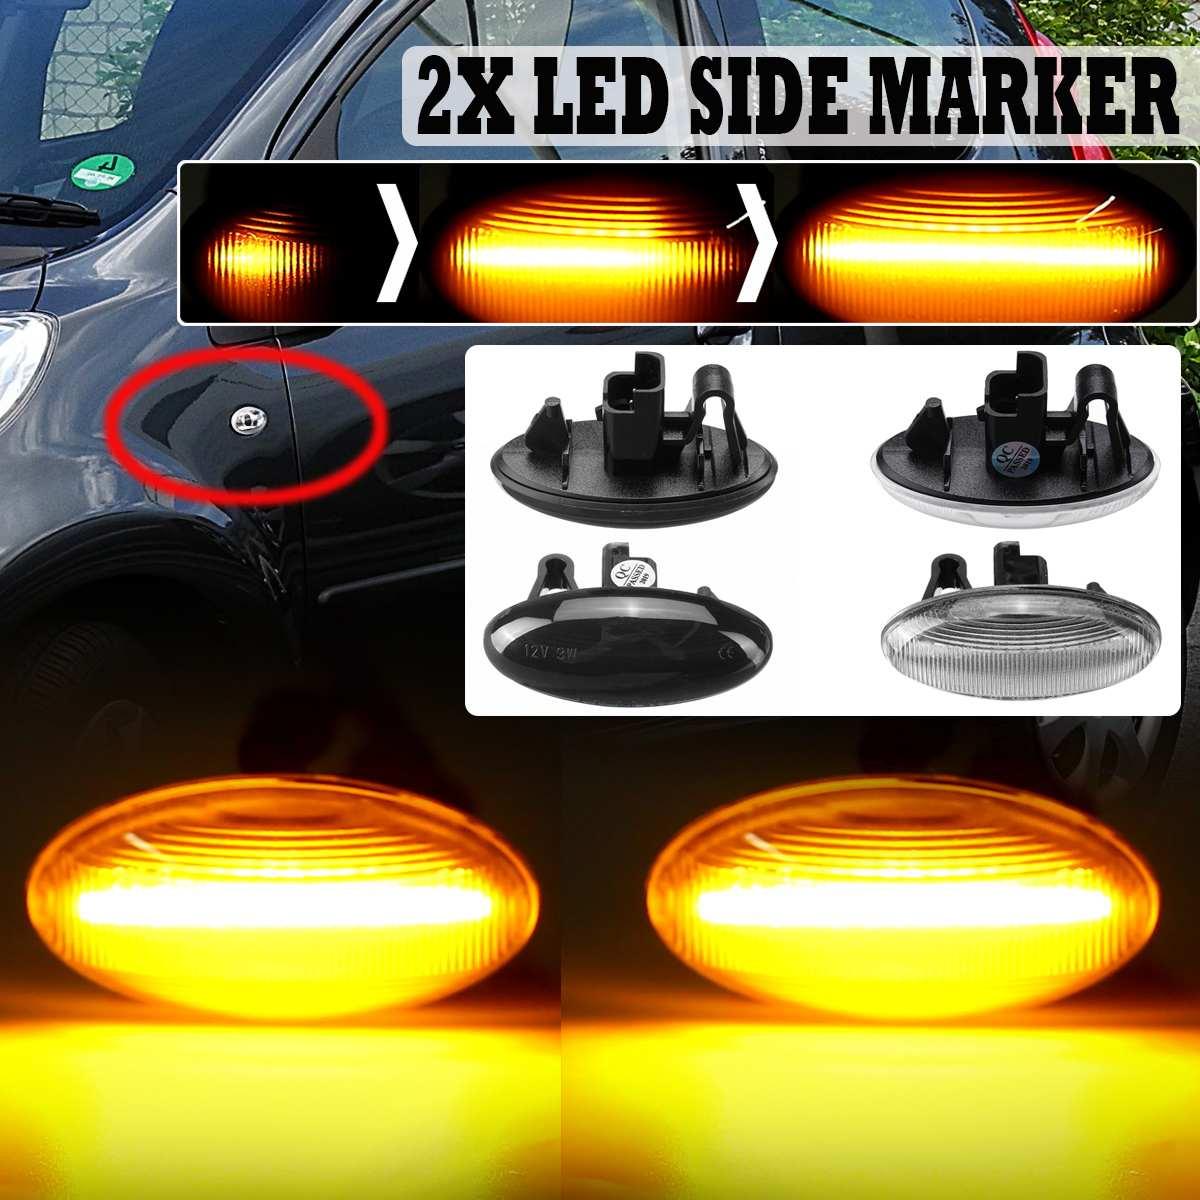 2x Dynamic Led Side Marker Flowing Led Turn Signal Light Sequential Blinker For Peugeot 307 206 207 407 107 For Citroen C1 C2 C3